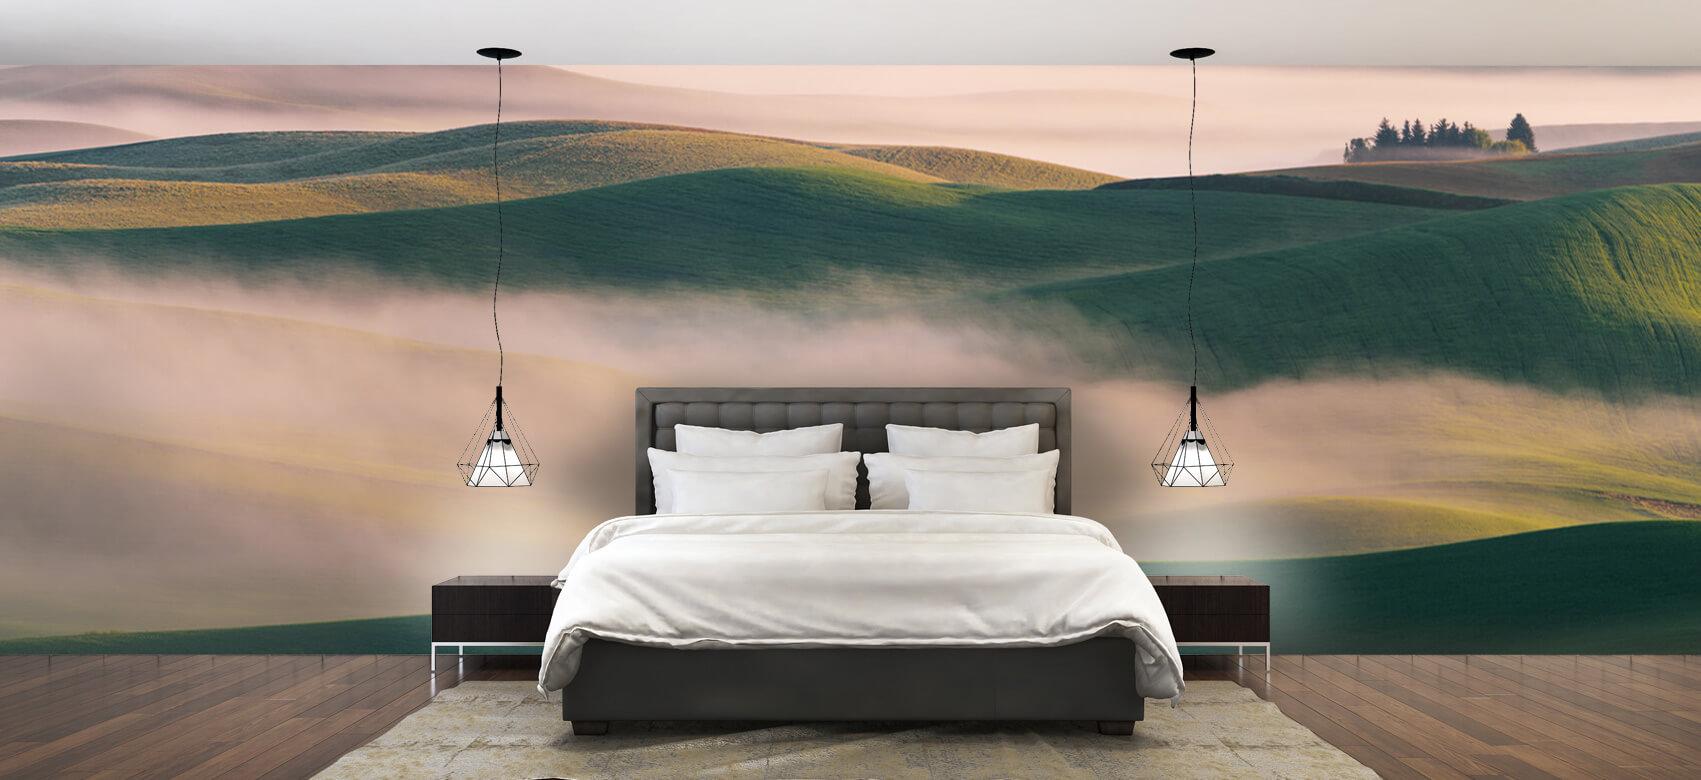 Landschap Dream Land in Morning Mist 1